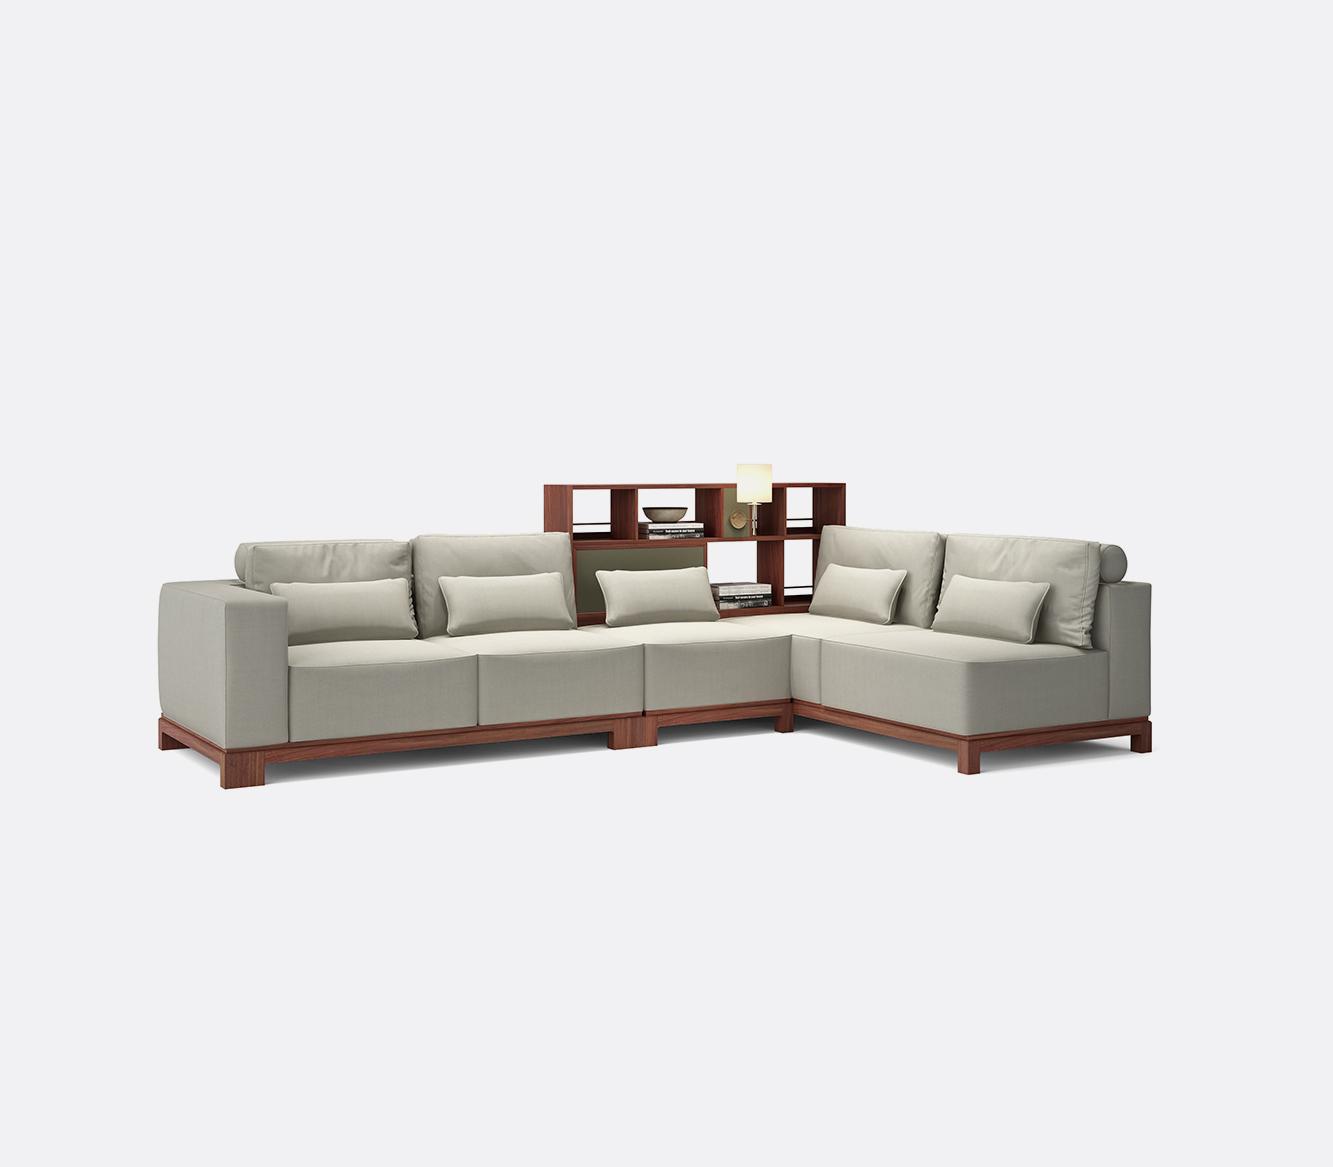 组合沙发 Modular Sofa  Y-61a1 / a2